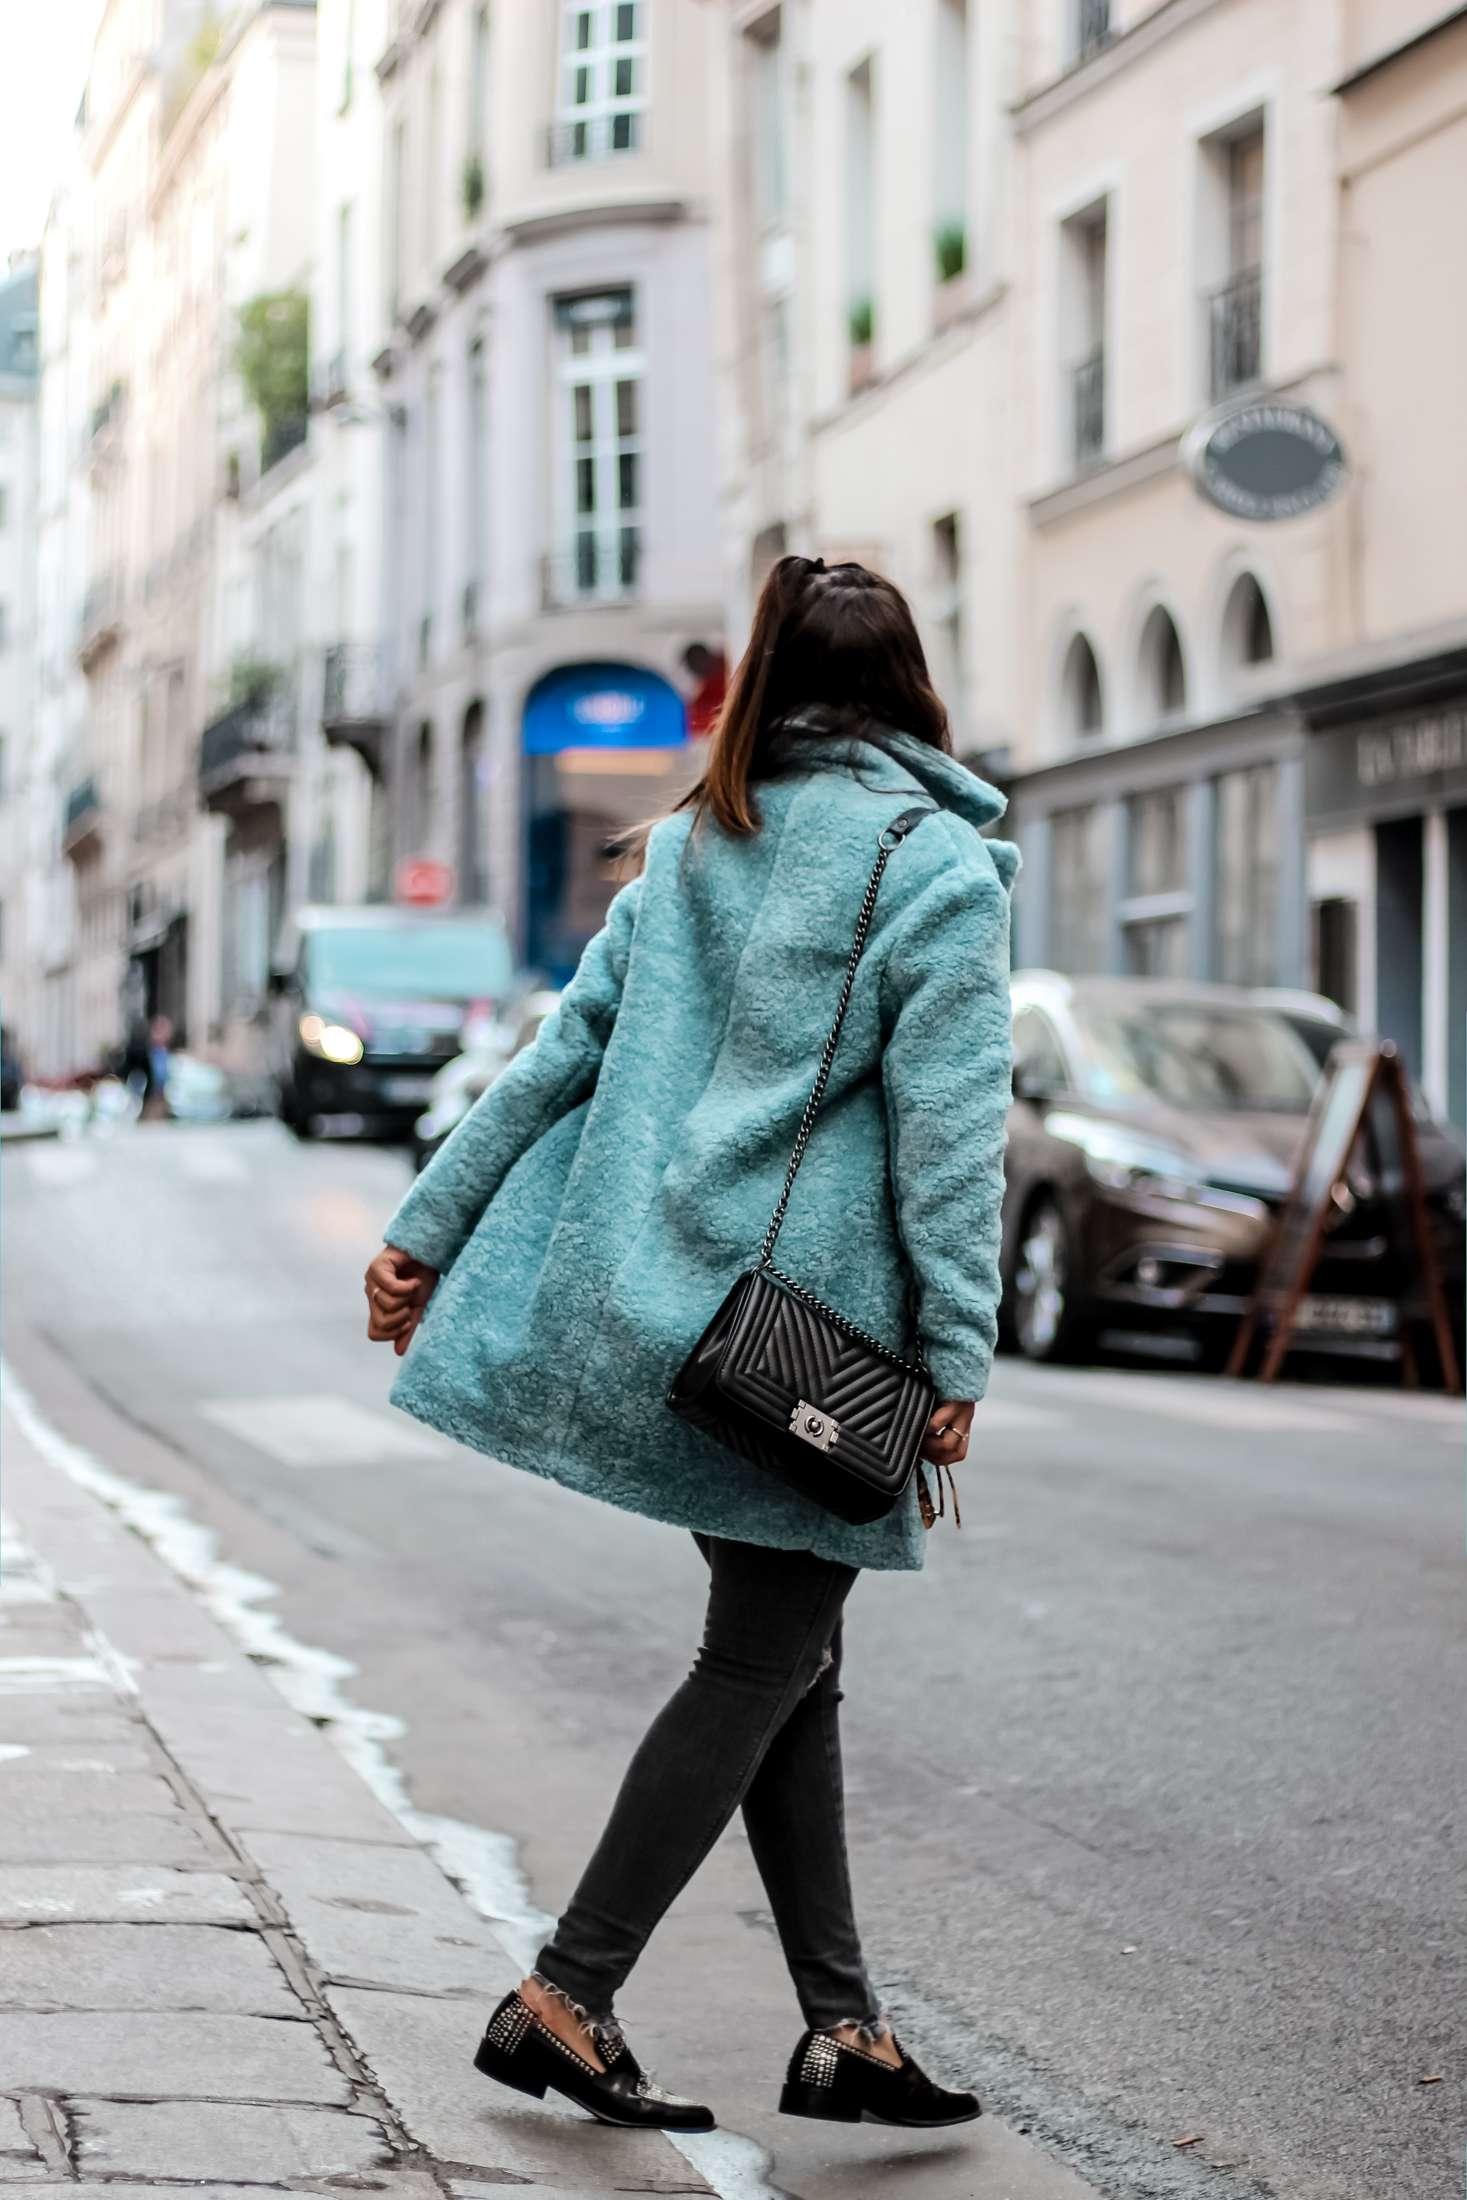 zara, h&m, manteau faux fur, manteau bleu faux fur, macassins femme, mocassins clous, sac inspi chanel, t shirt inspi gucci, the green ananas, blogueuse mode, blog mode, manteau femme, blue mood, cluse, jimmy fairly, caroline receveur